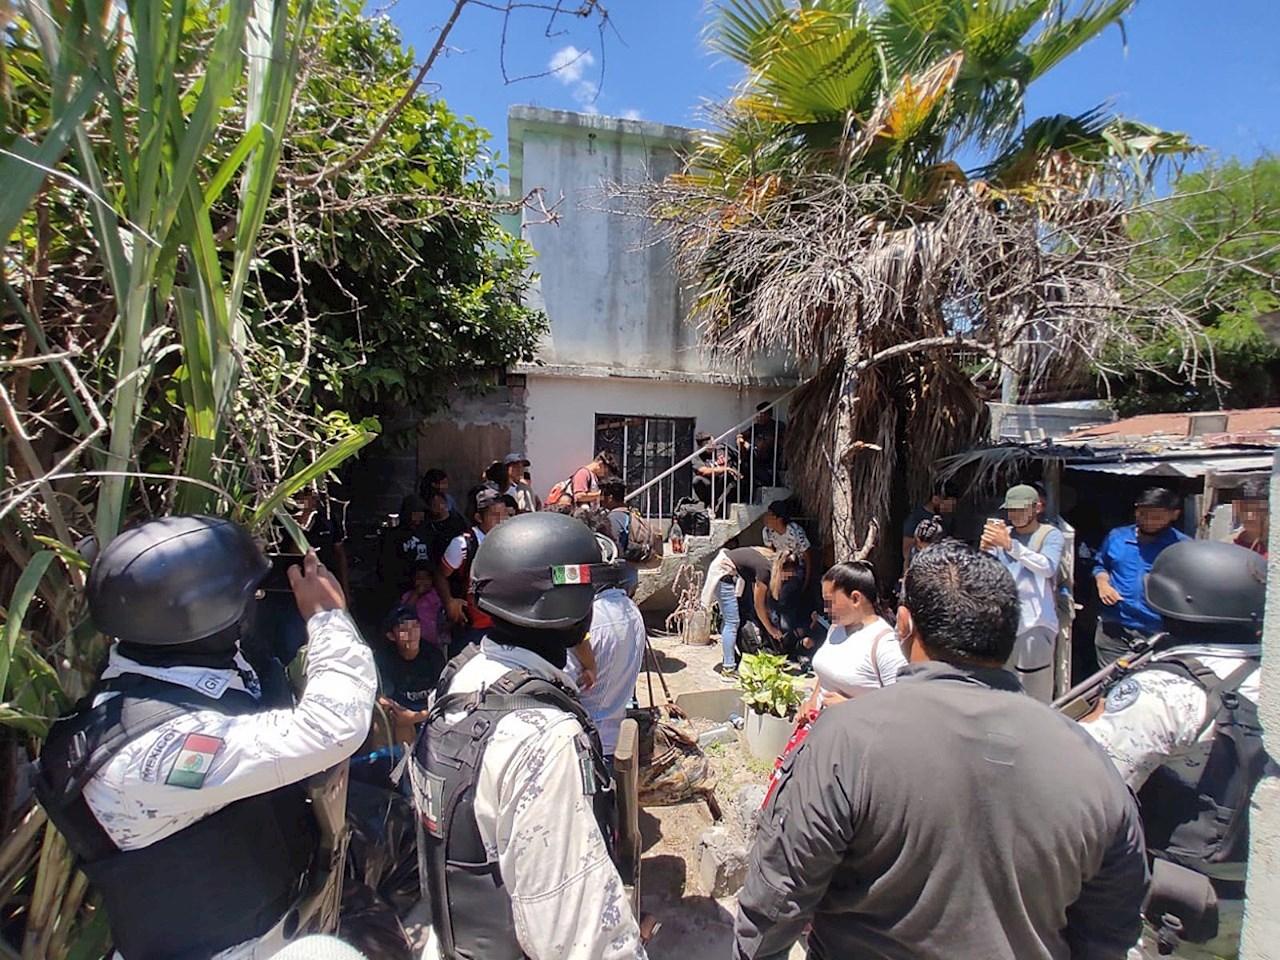 Autoridades mexicanas interceptan a 55 migrantes centroamericanos